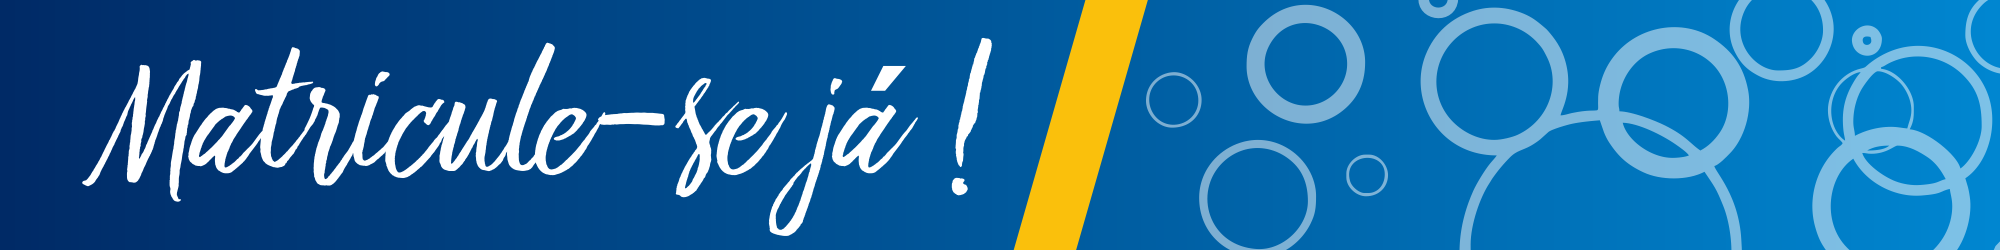 Banner_matricula